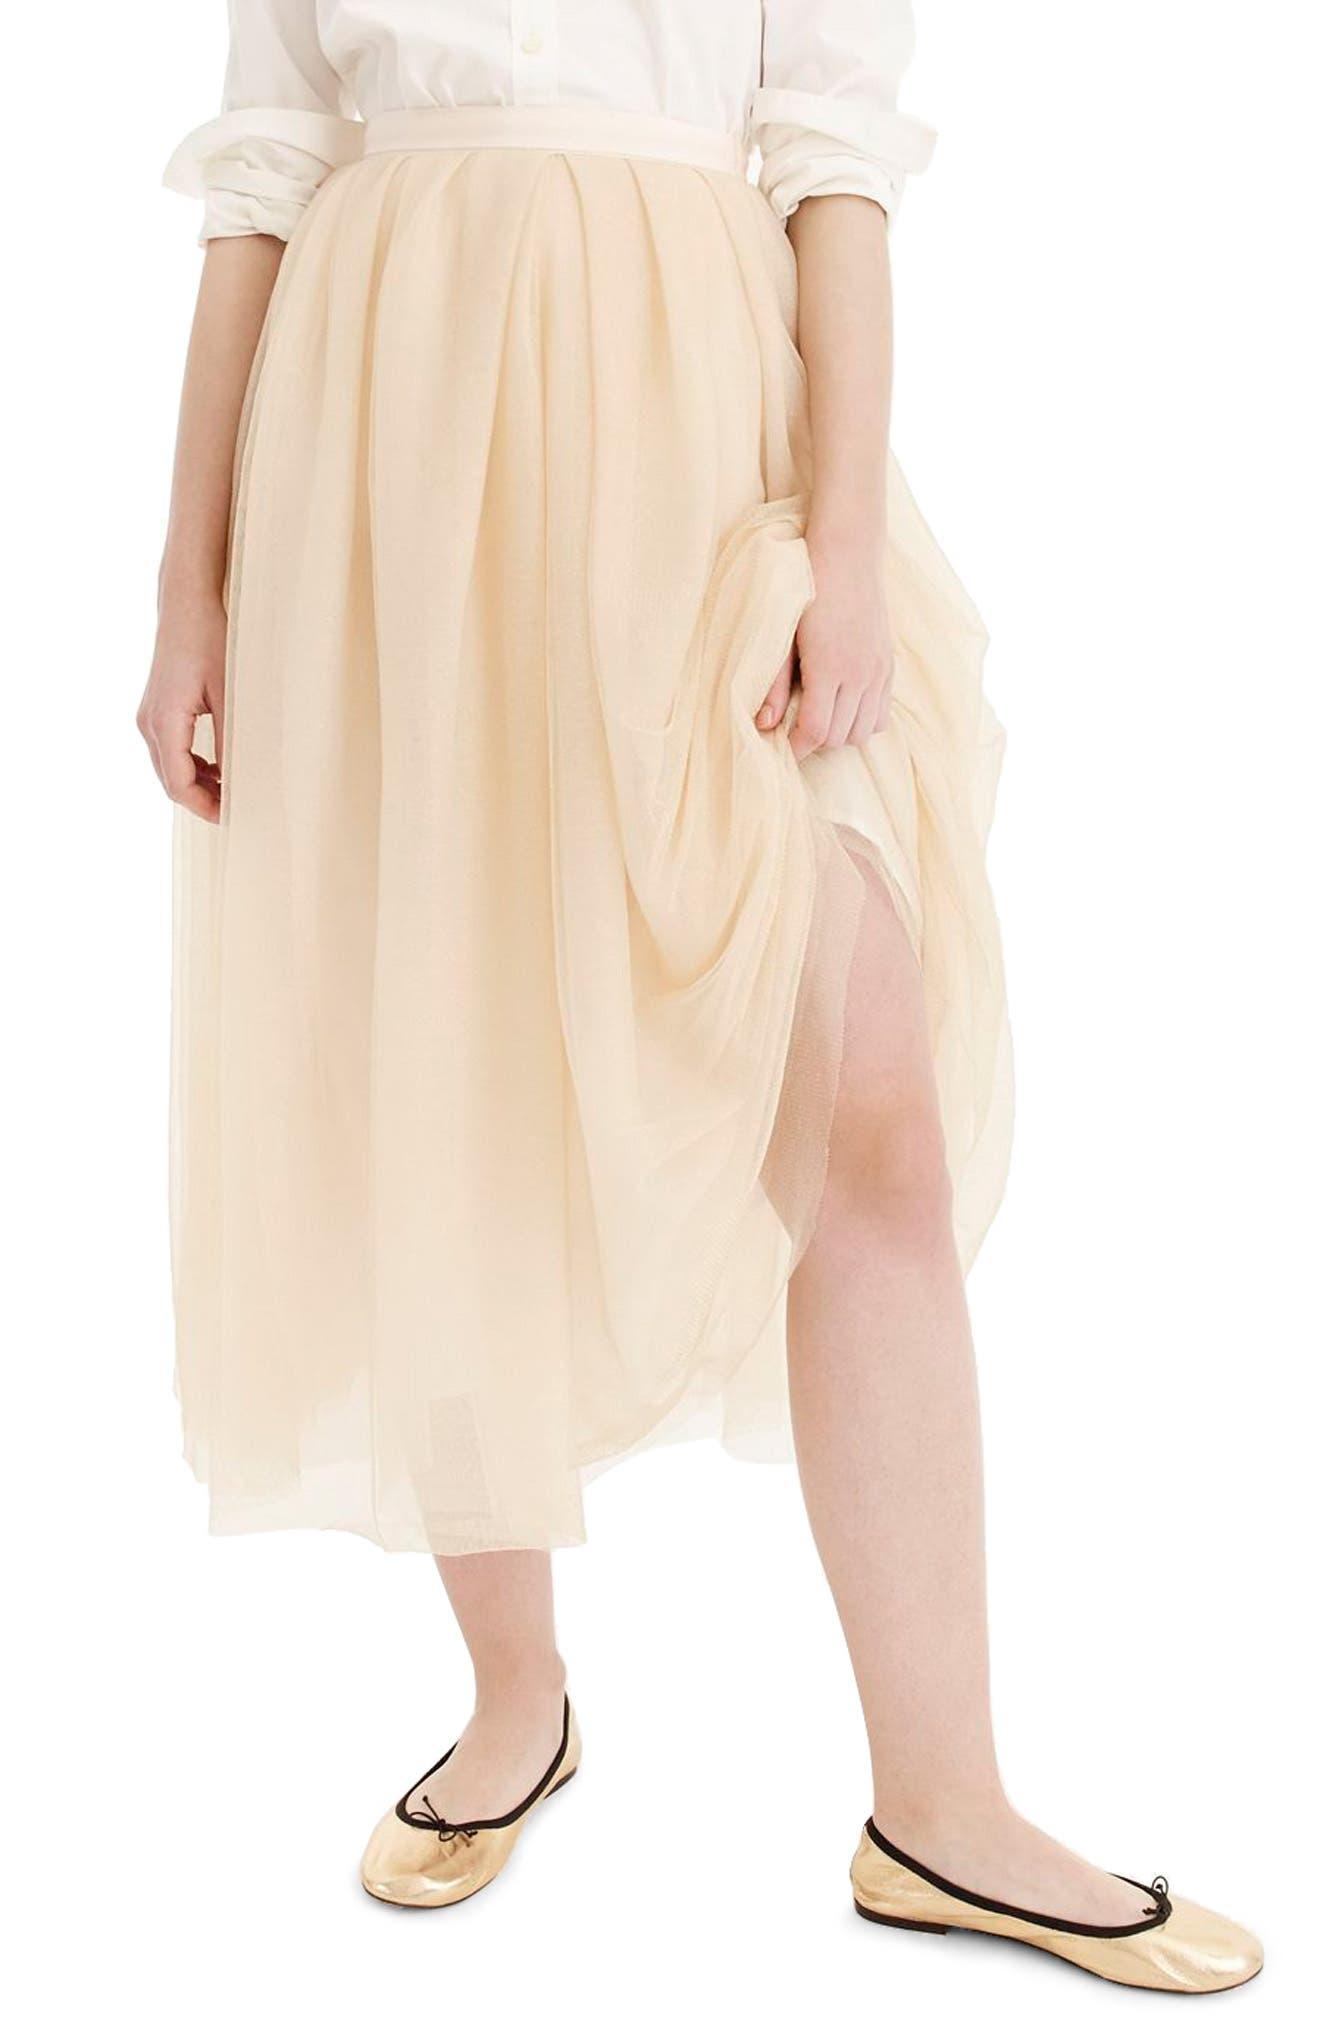 Tulle Ball Skirt,                             Main thumbnail 1, color,                             700